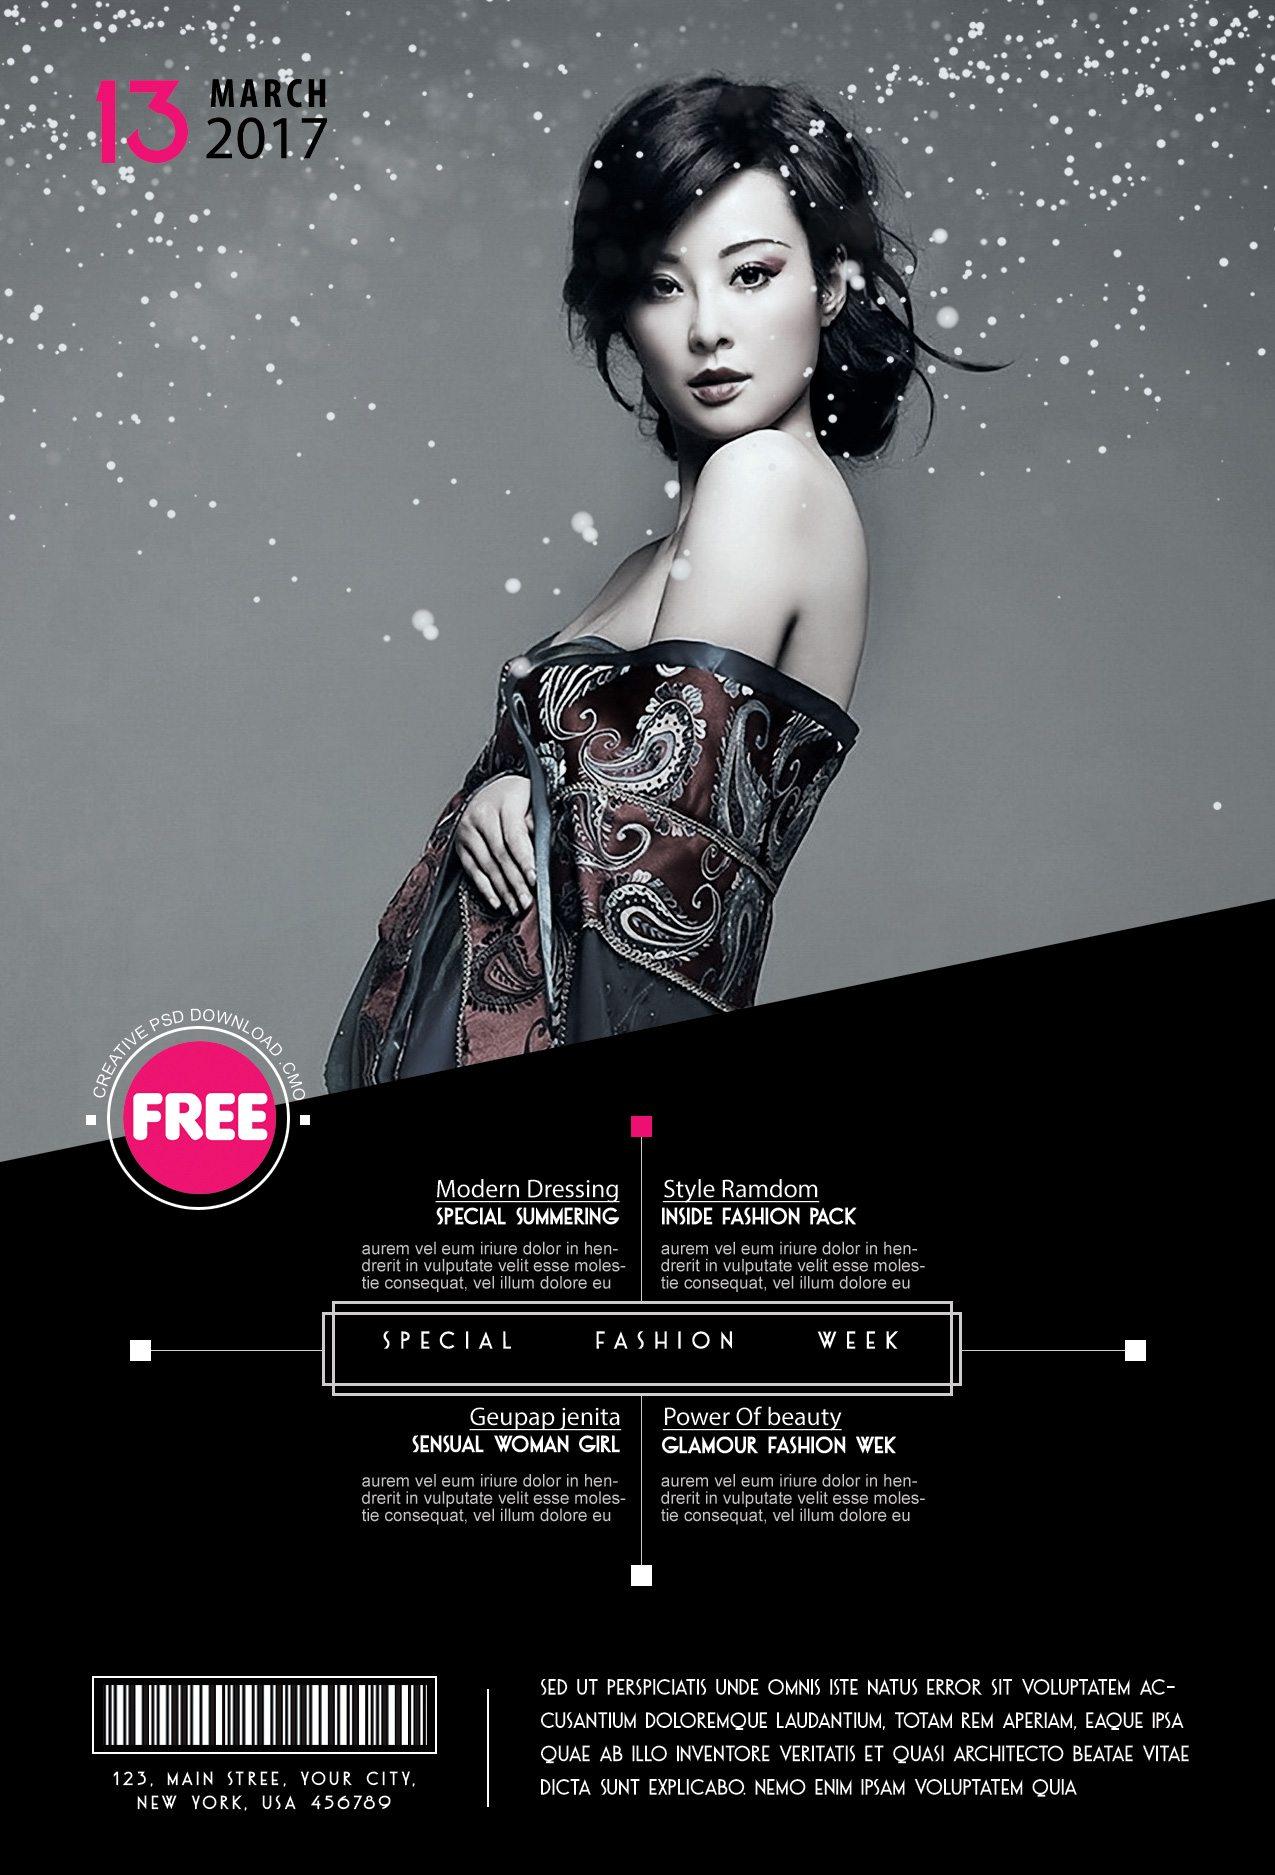 Special fashion week flyer